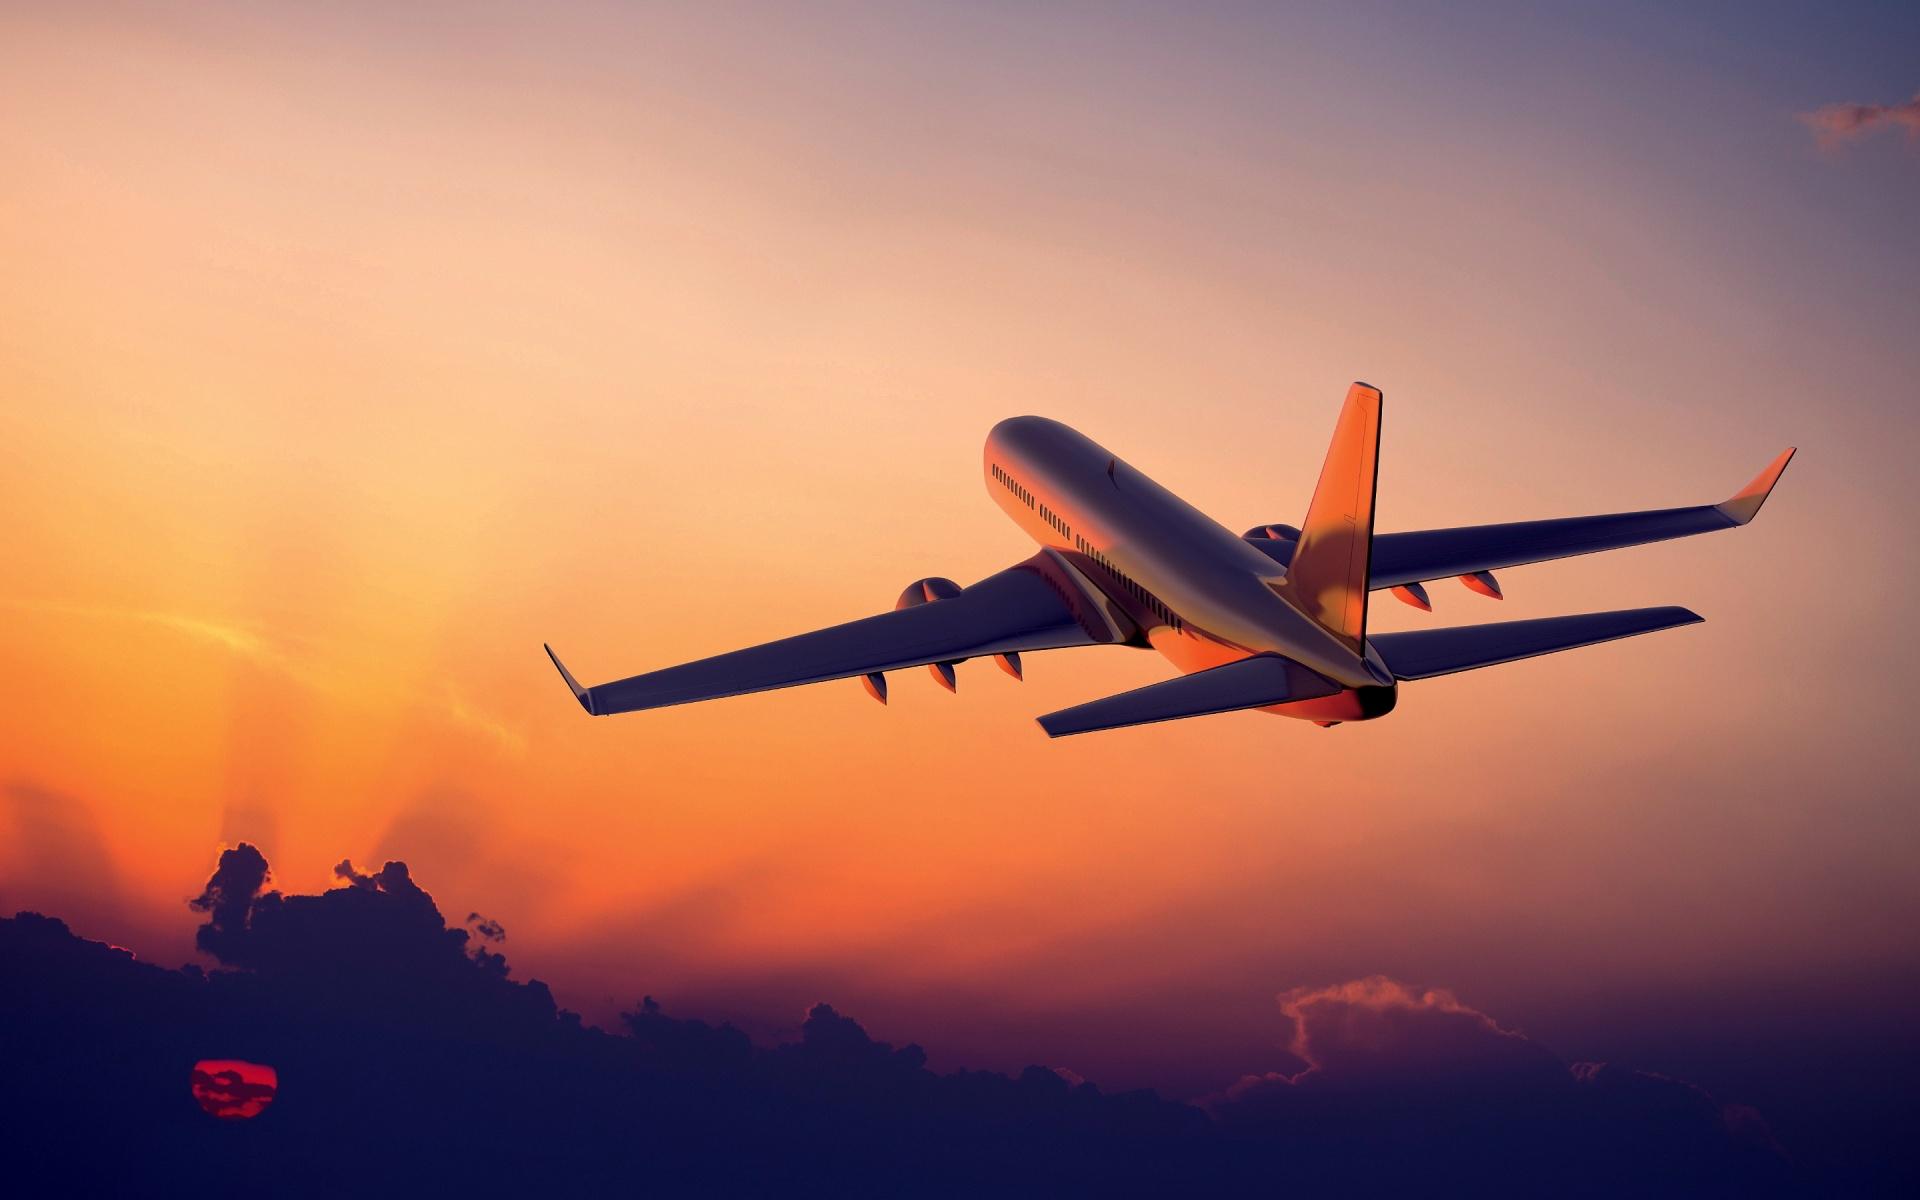 TIF airplane wallpaper 2 airplane wallpaper 3 ...